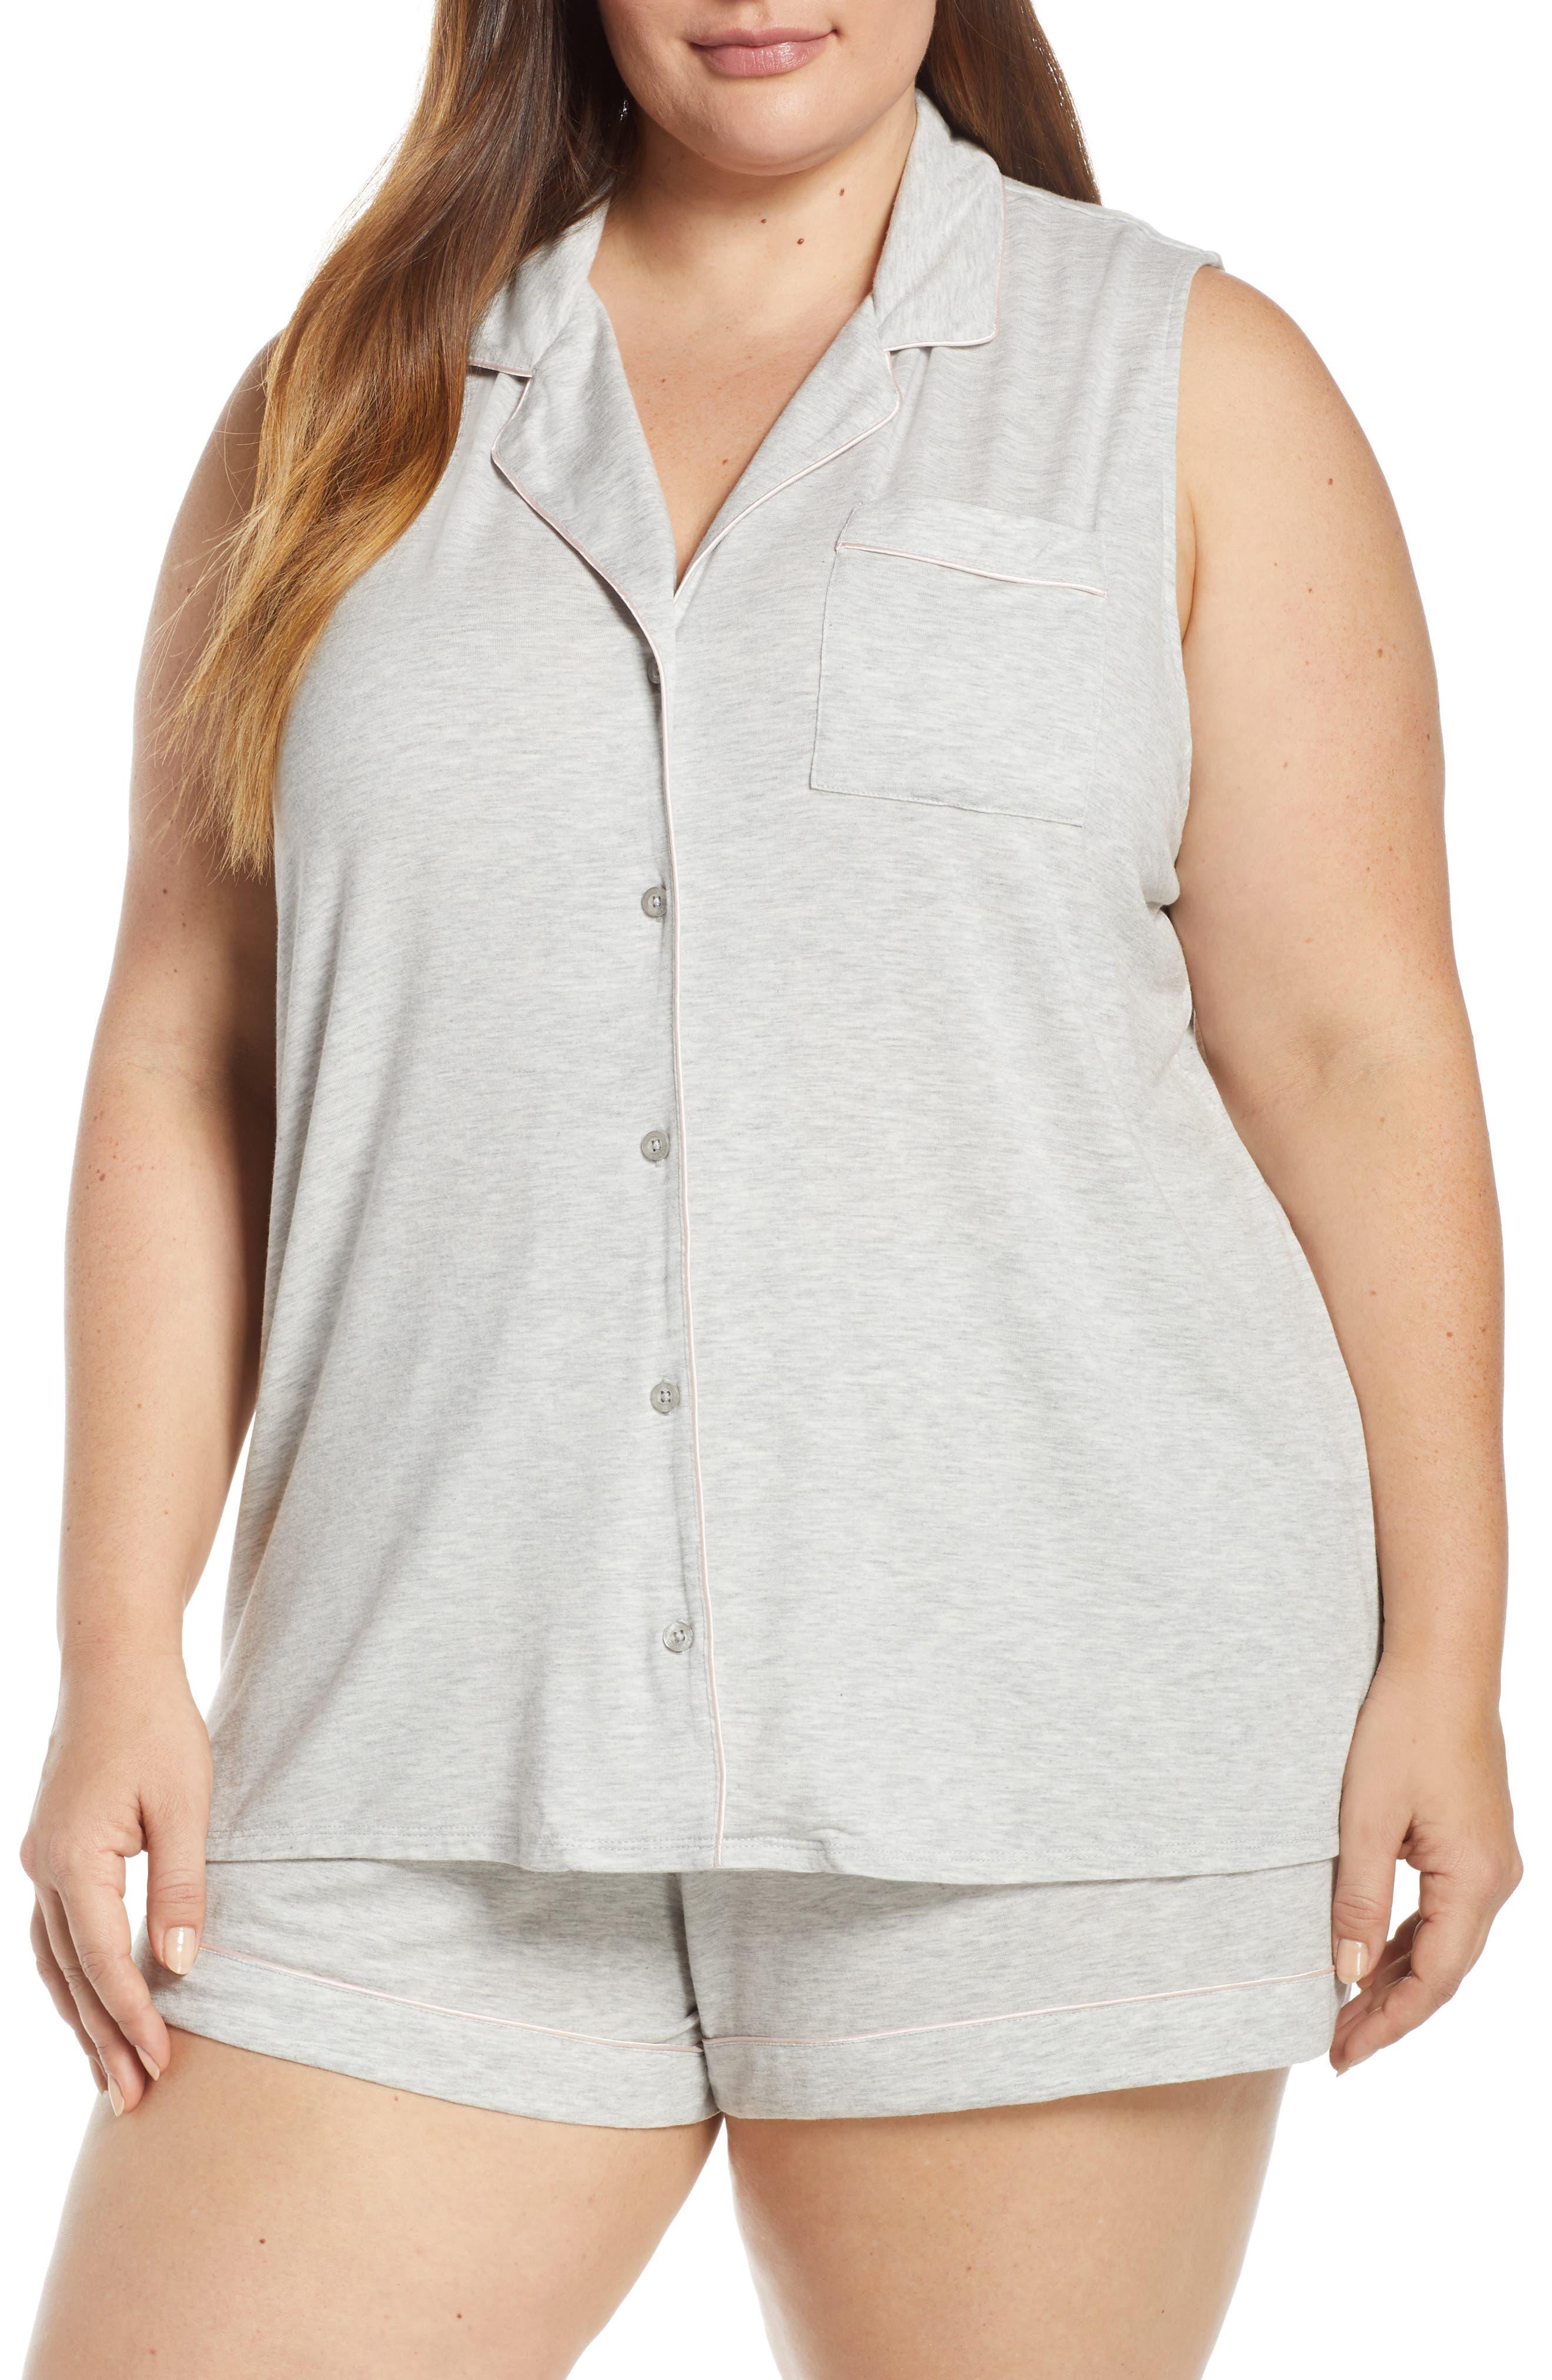 Plus Size Nordstrom Lingerie Moonlight Short Pajamas